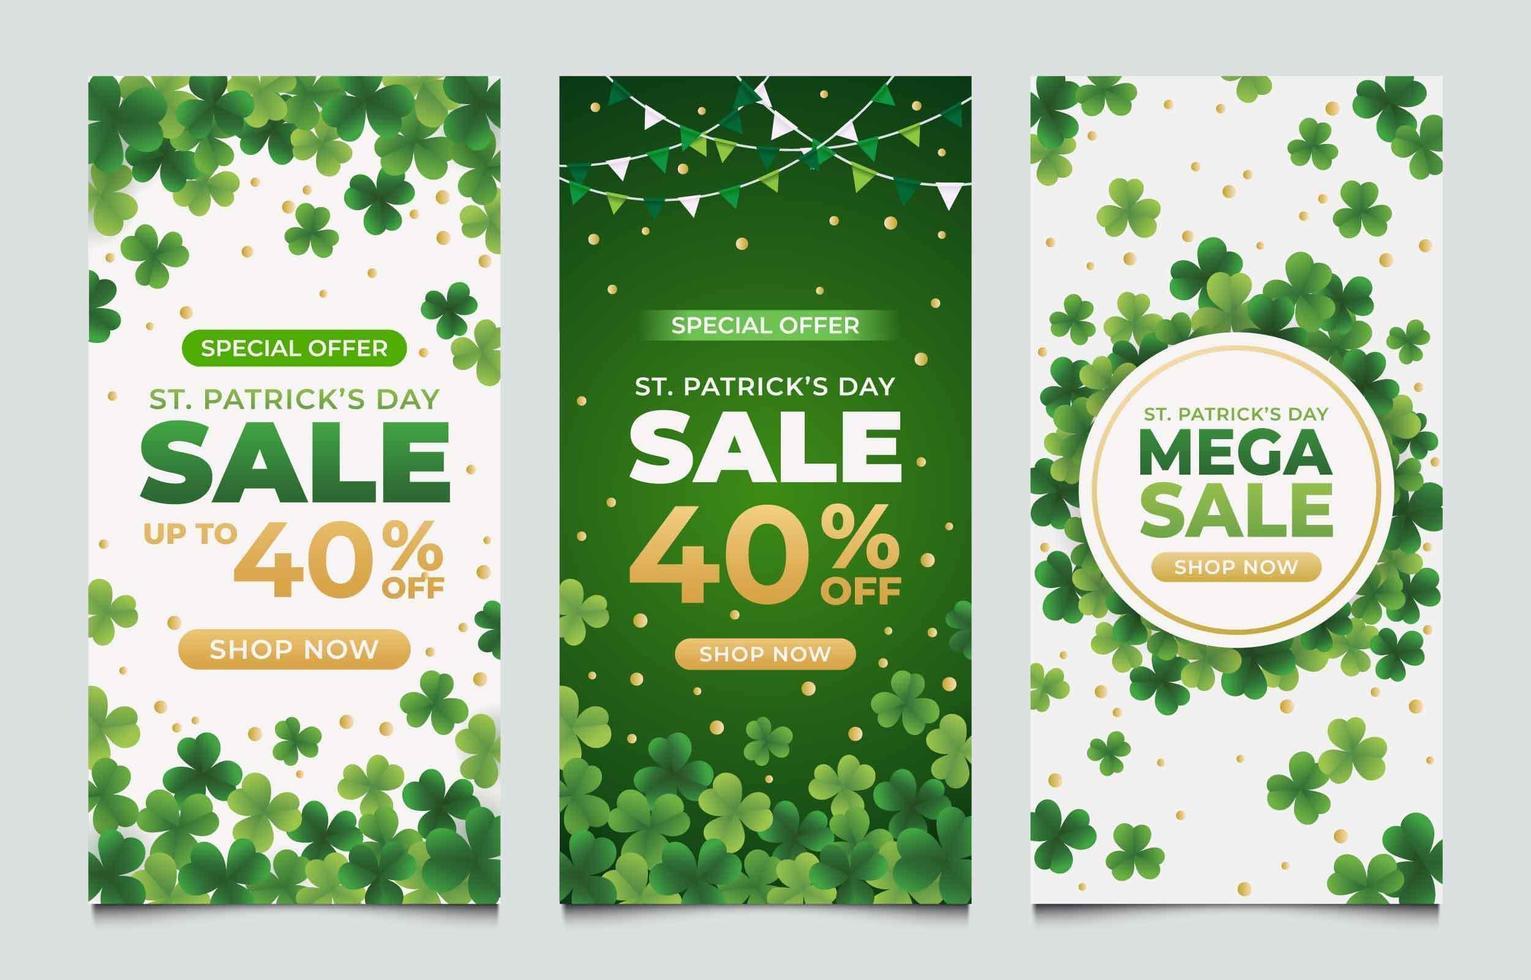 Saint Patrick's Sale Banner with Clover Design vector